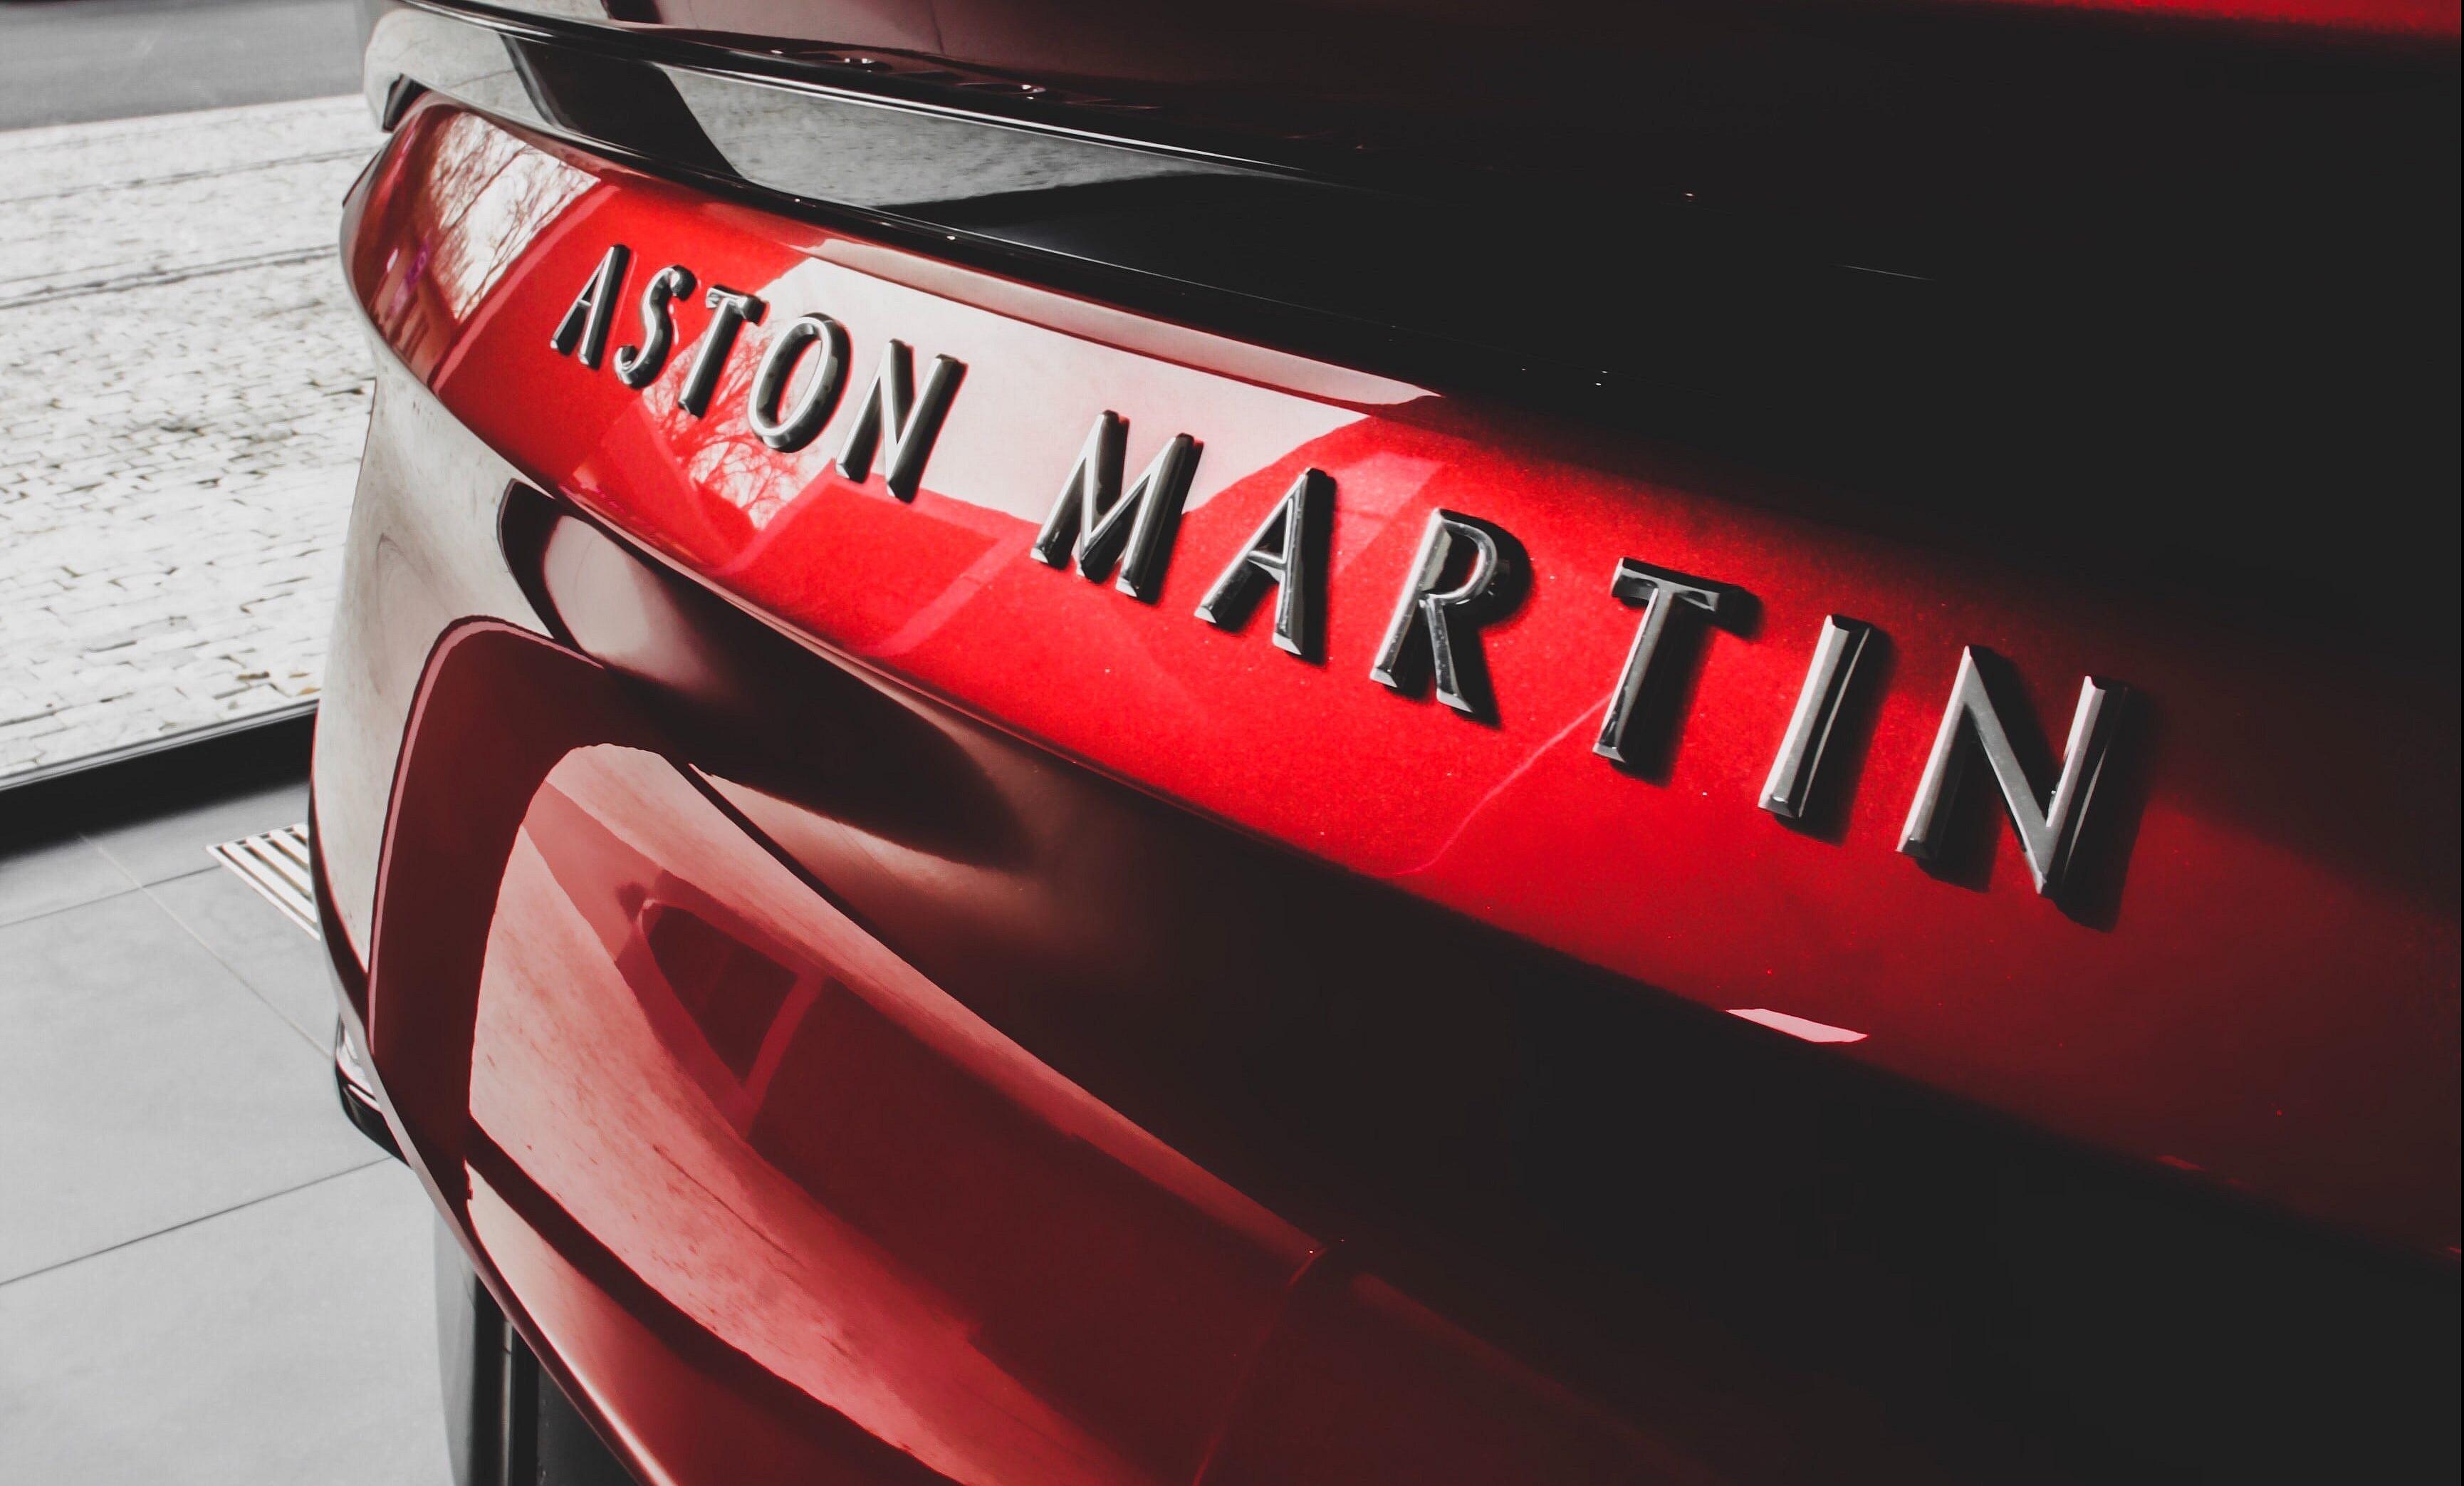 Todd Sutherland: Aston Martin luxury British sports cars